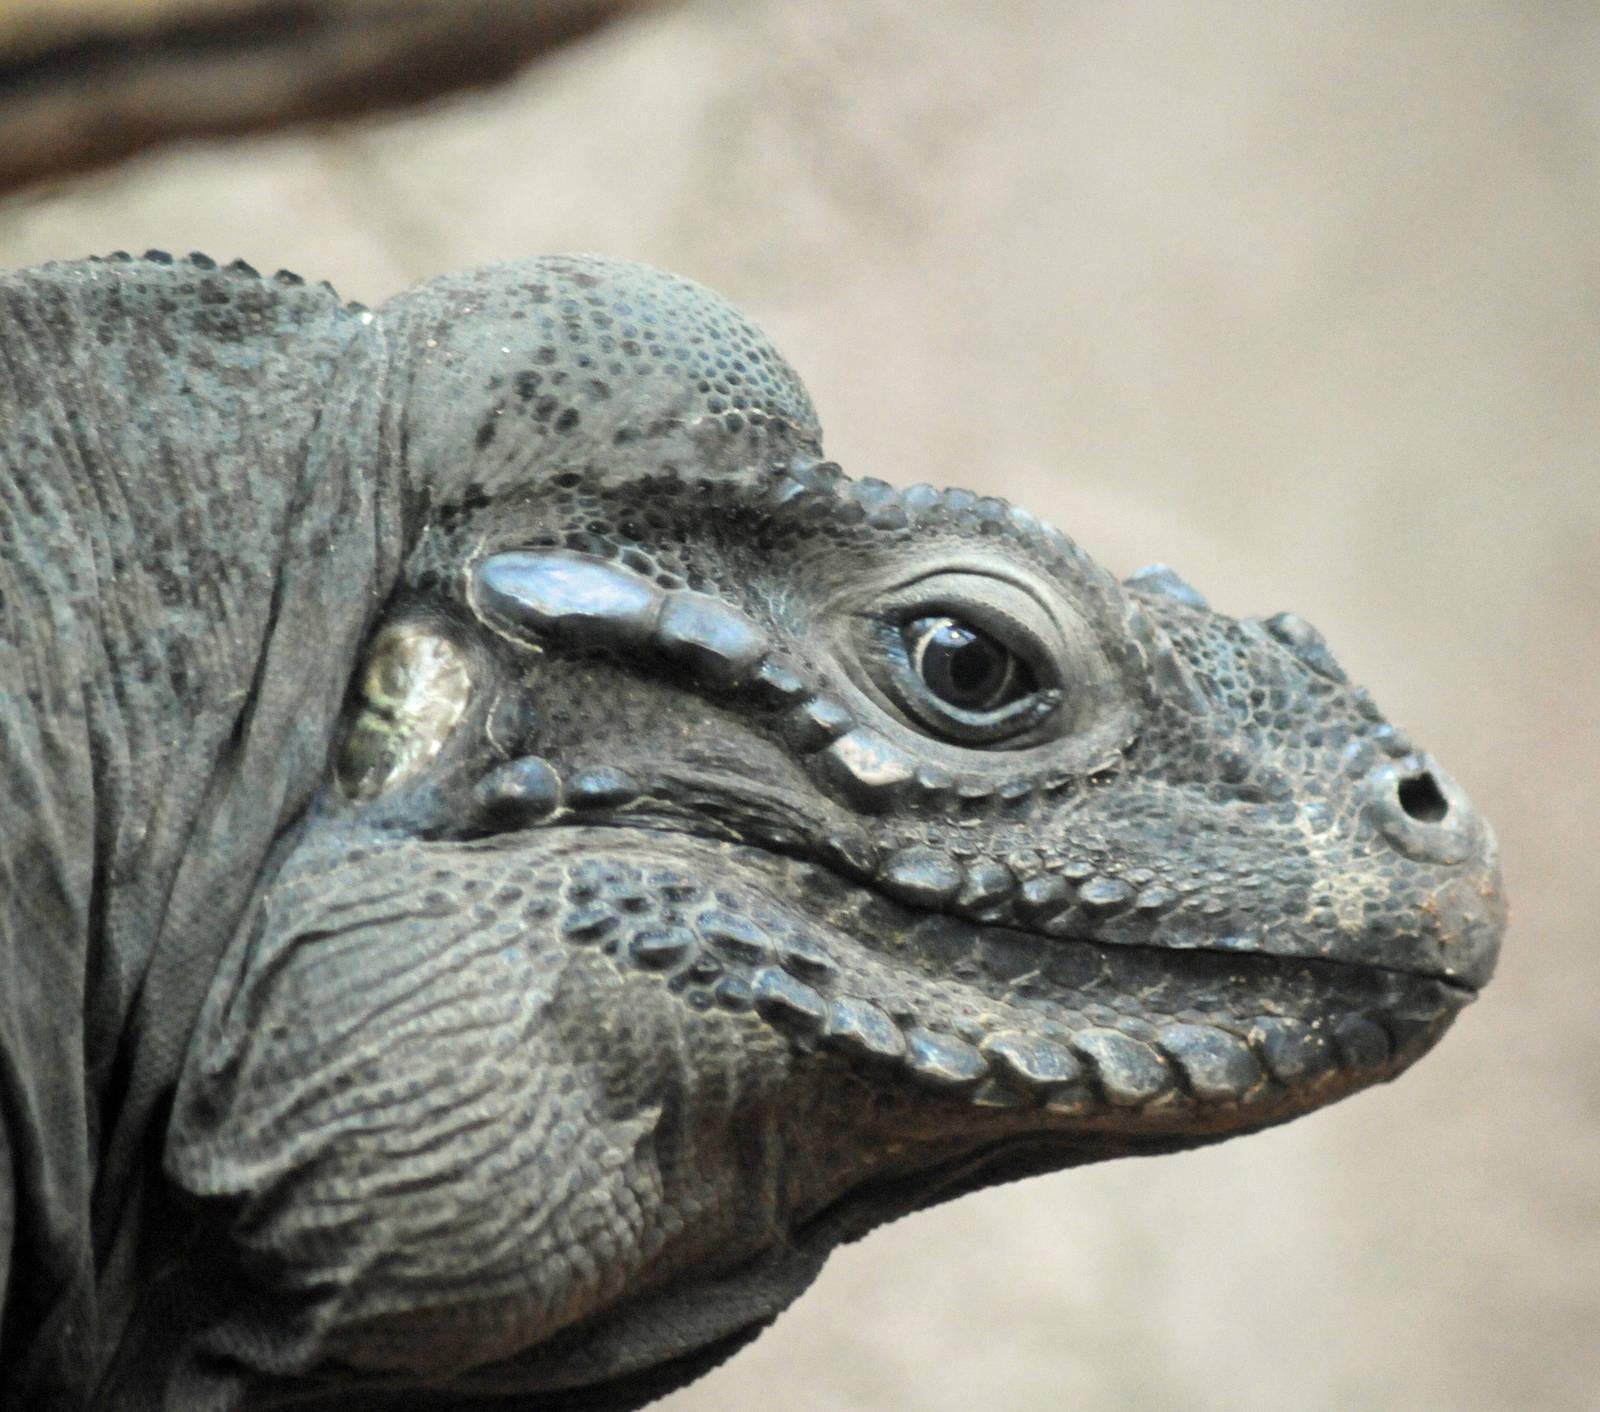 rhinoceros_iguana1_136389.jpg